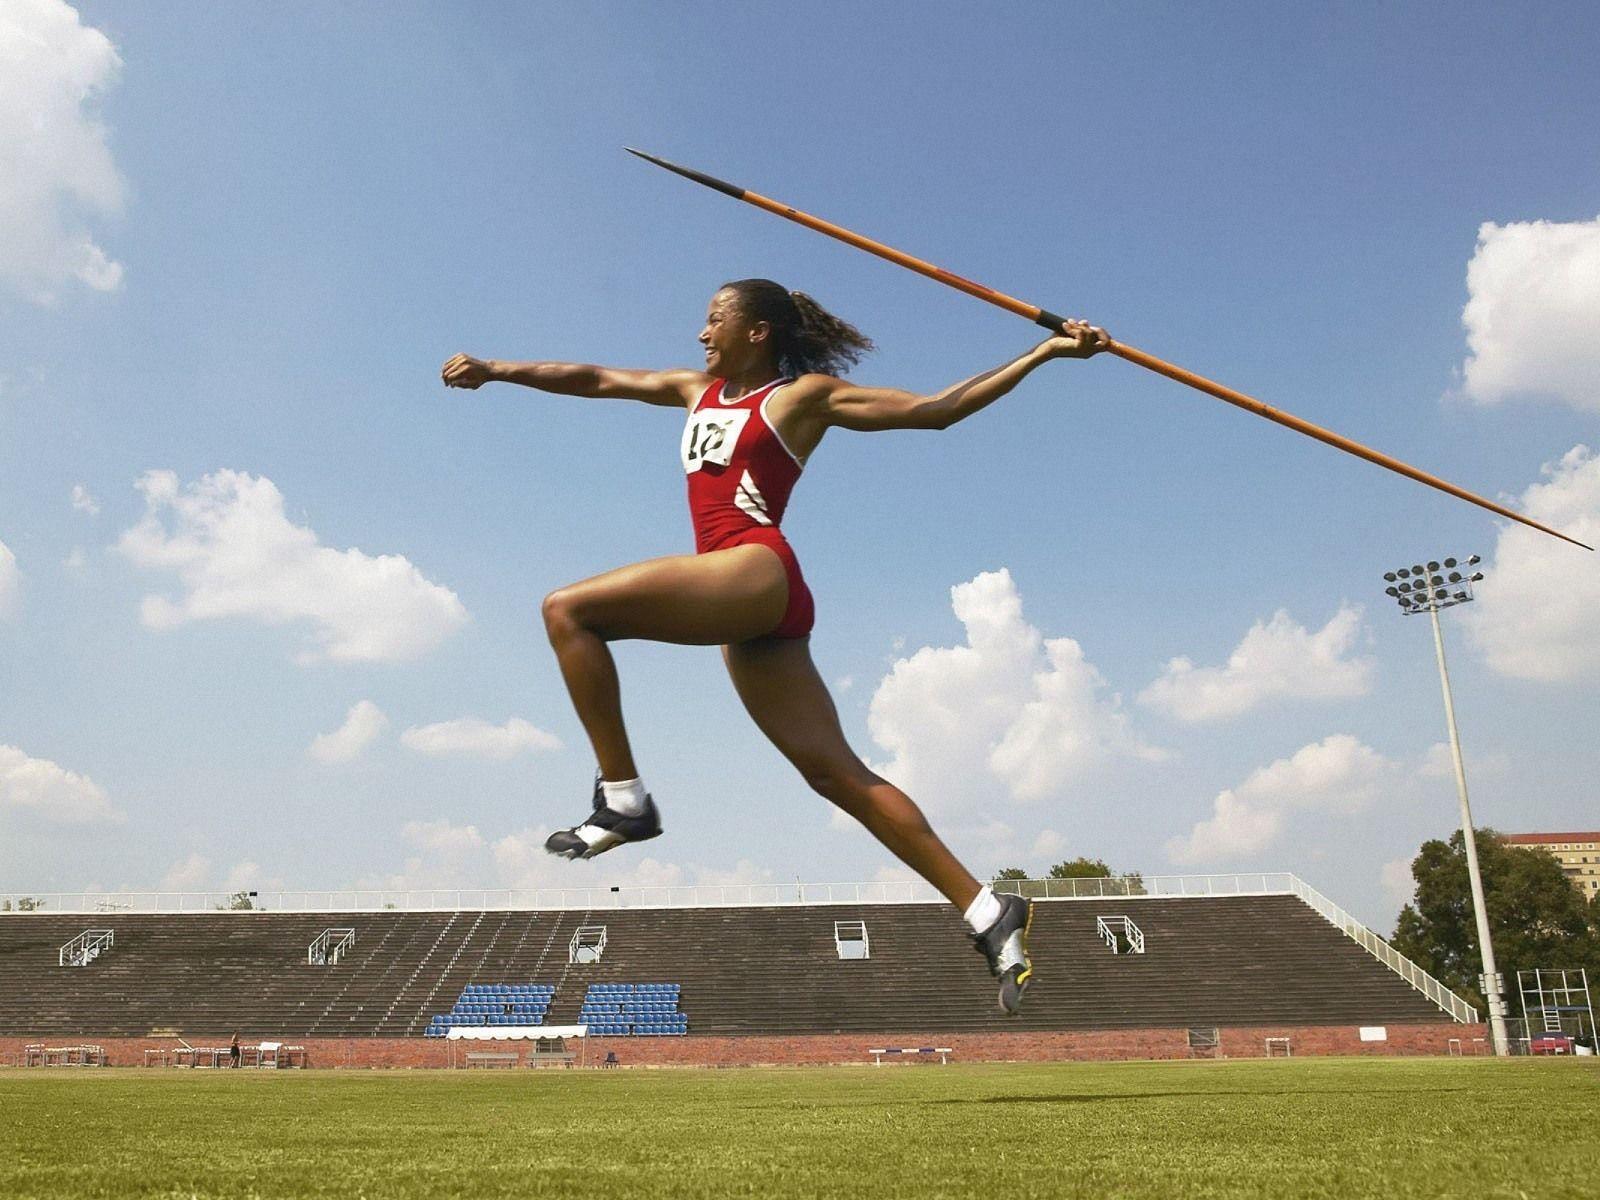 Girls Javelin Women Javelin Throw 1600x1200 Wallpapers 1600x1200 Wallpapers Javelin Throw Track And Field Javelin